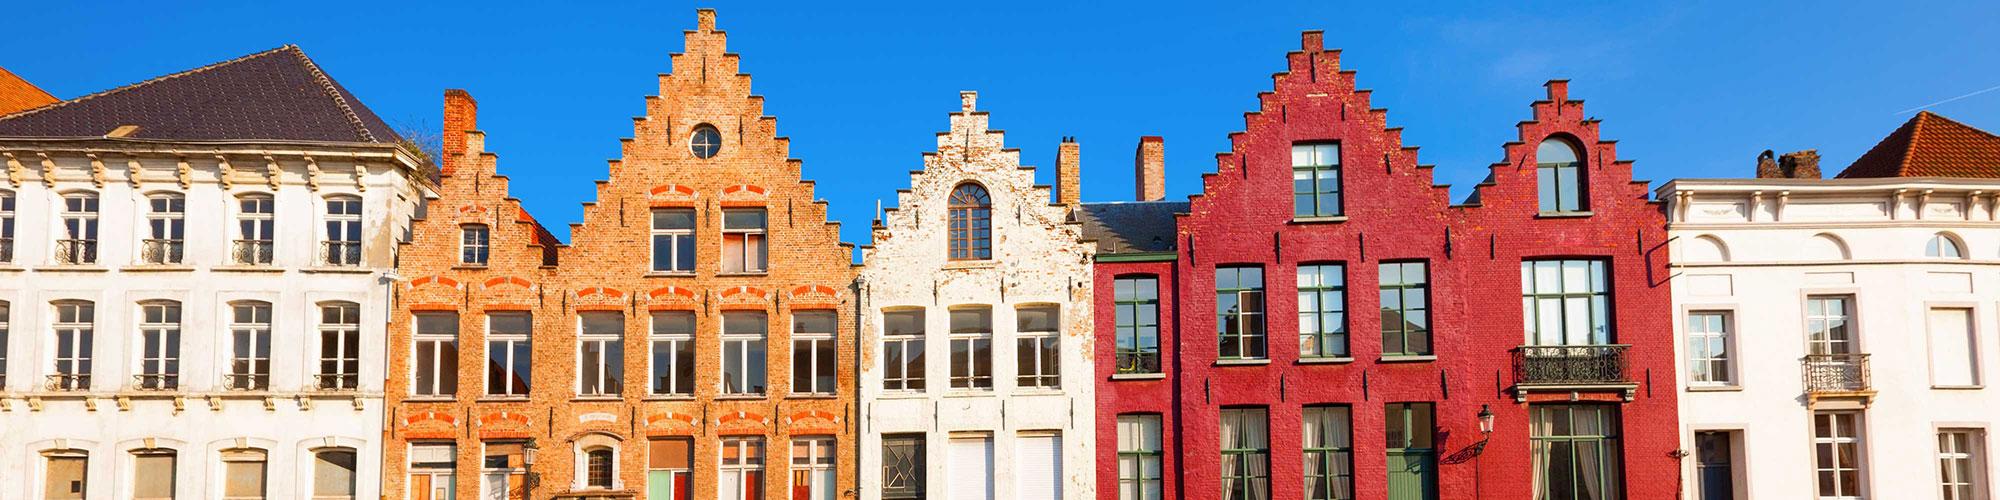 Belgian Dutch Style Buildings in Belgium Colorful